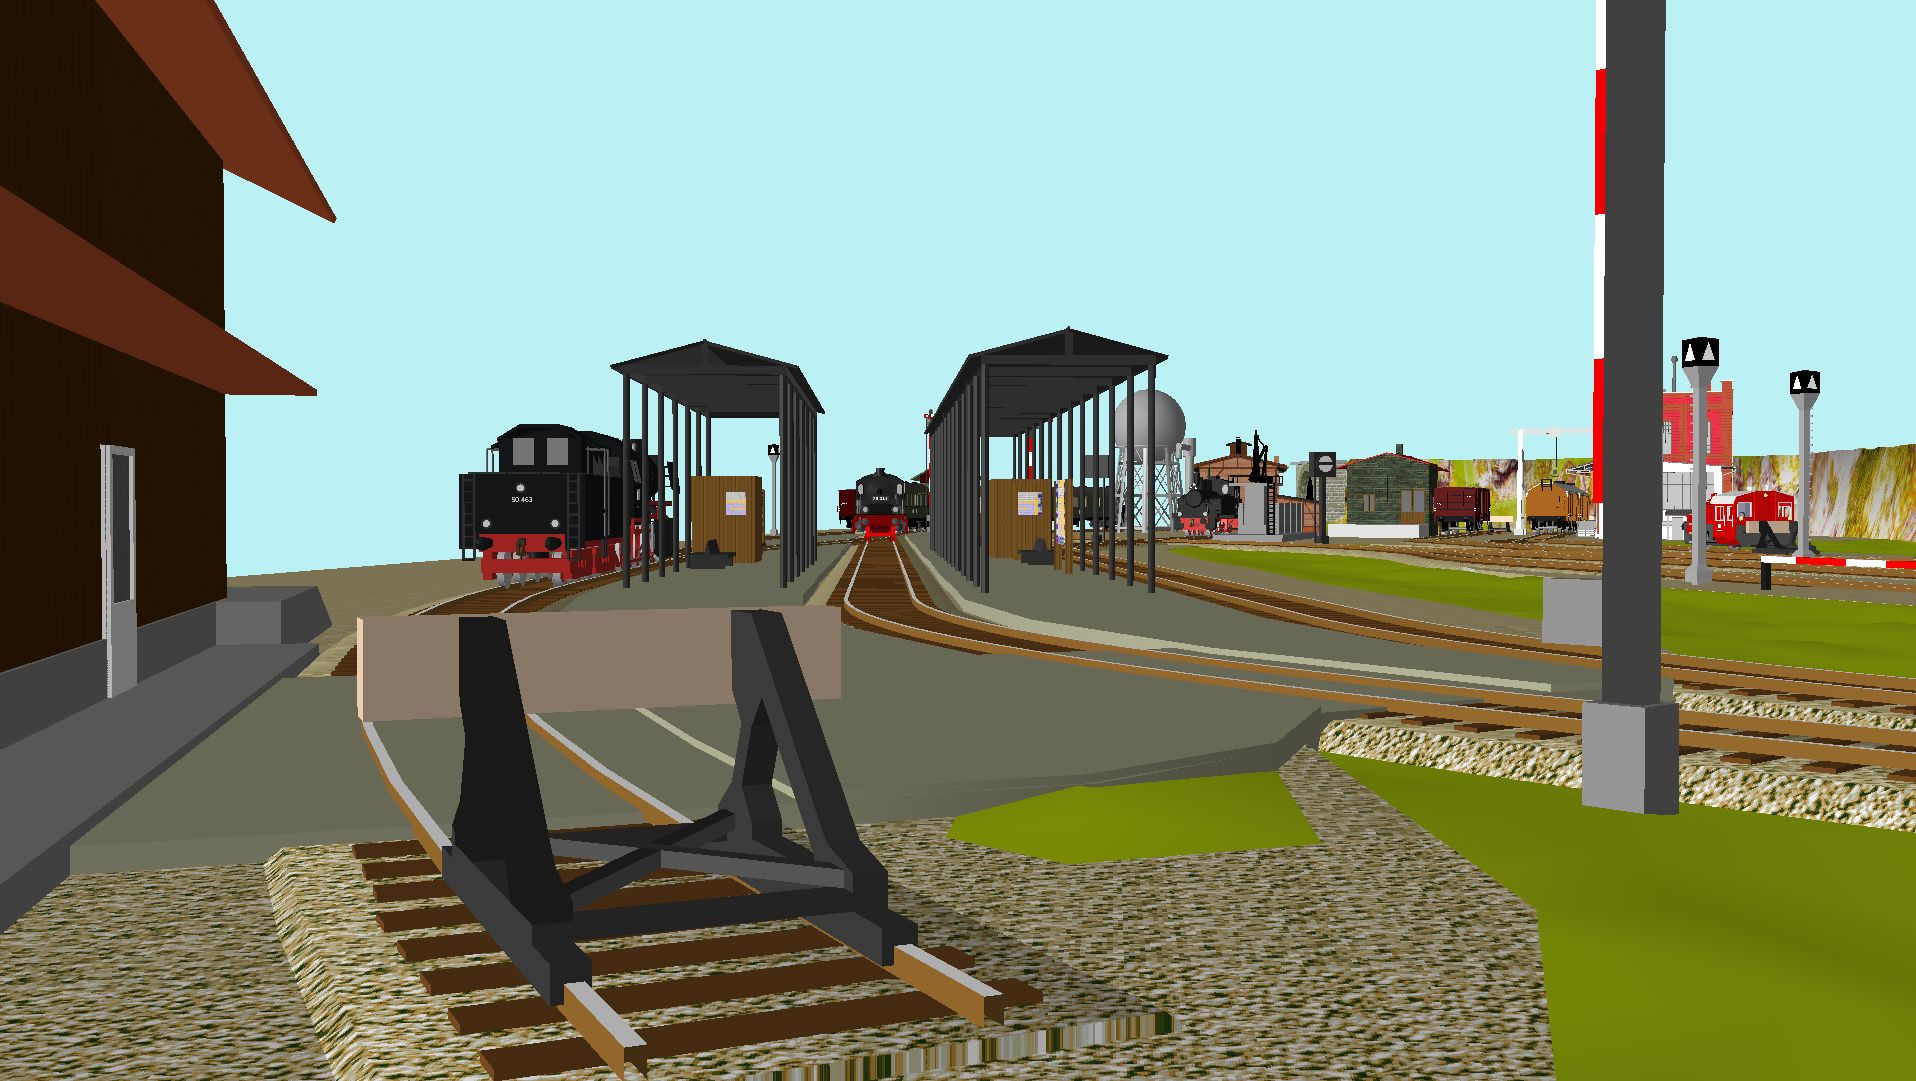 'ALBA Modellbahnpraxis' Band 1, Plan 5 Amp-1_5_c-gleis_freilqtk3r